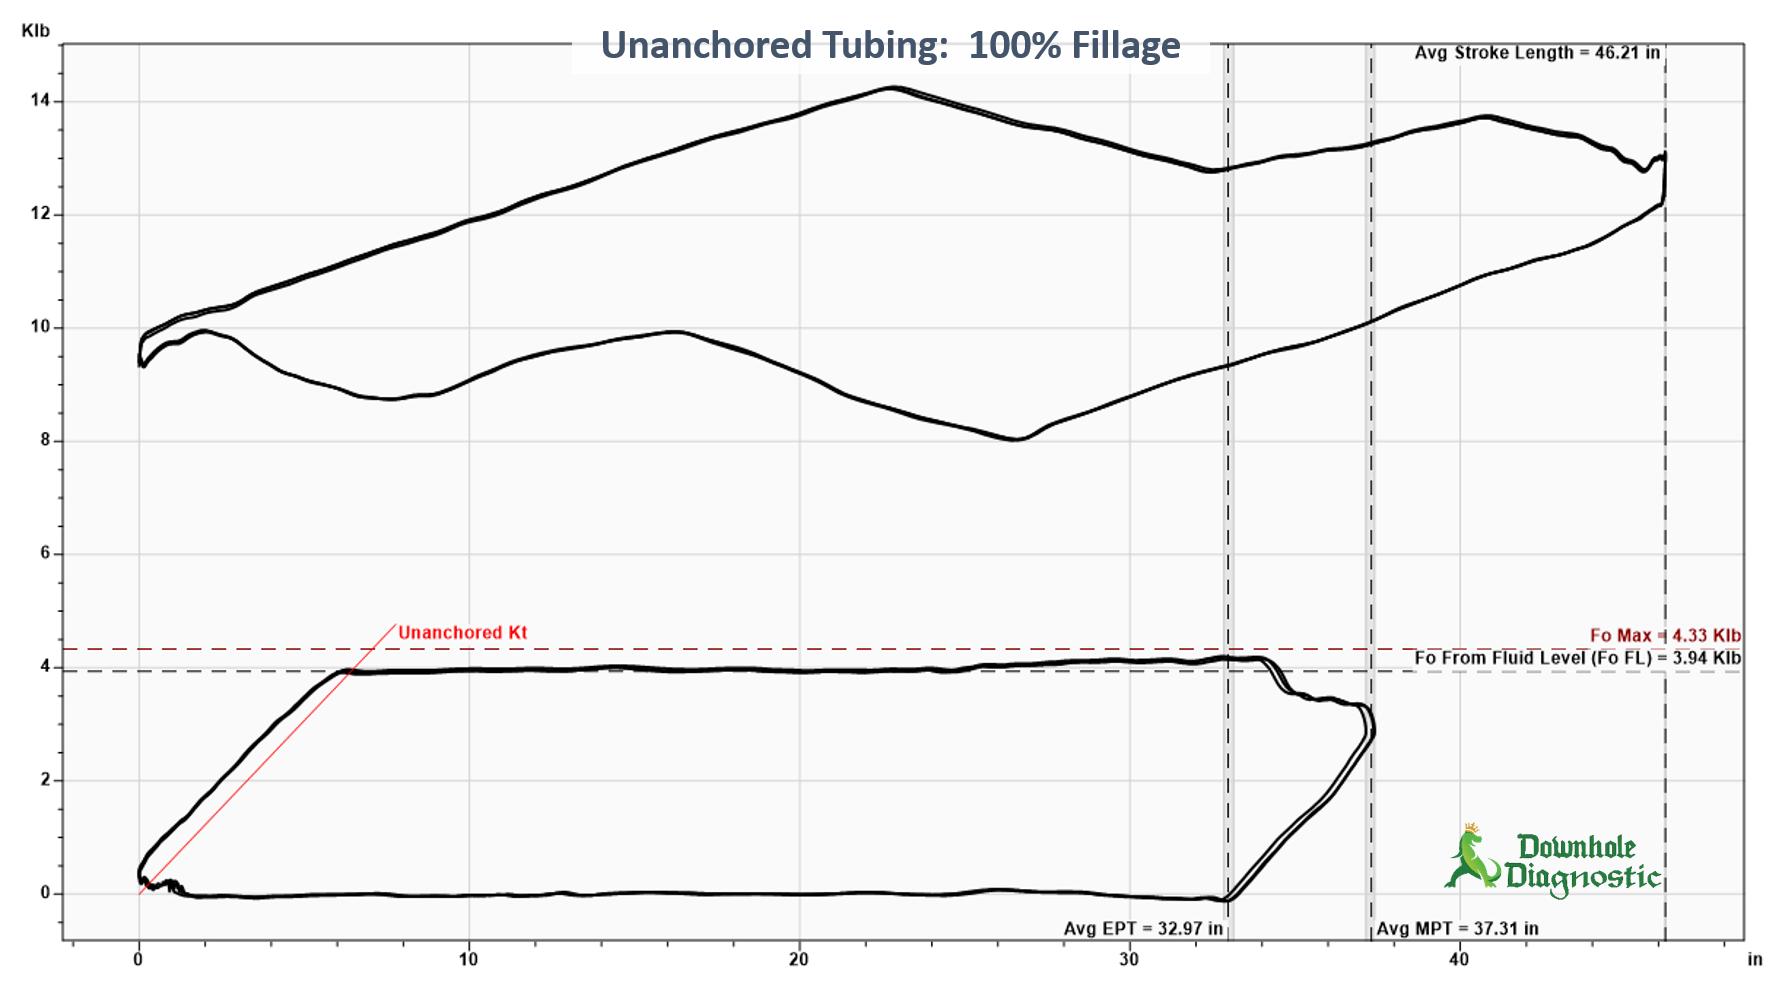 Unanchored Tubing